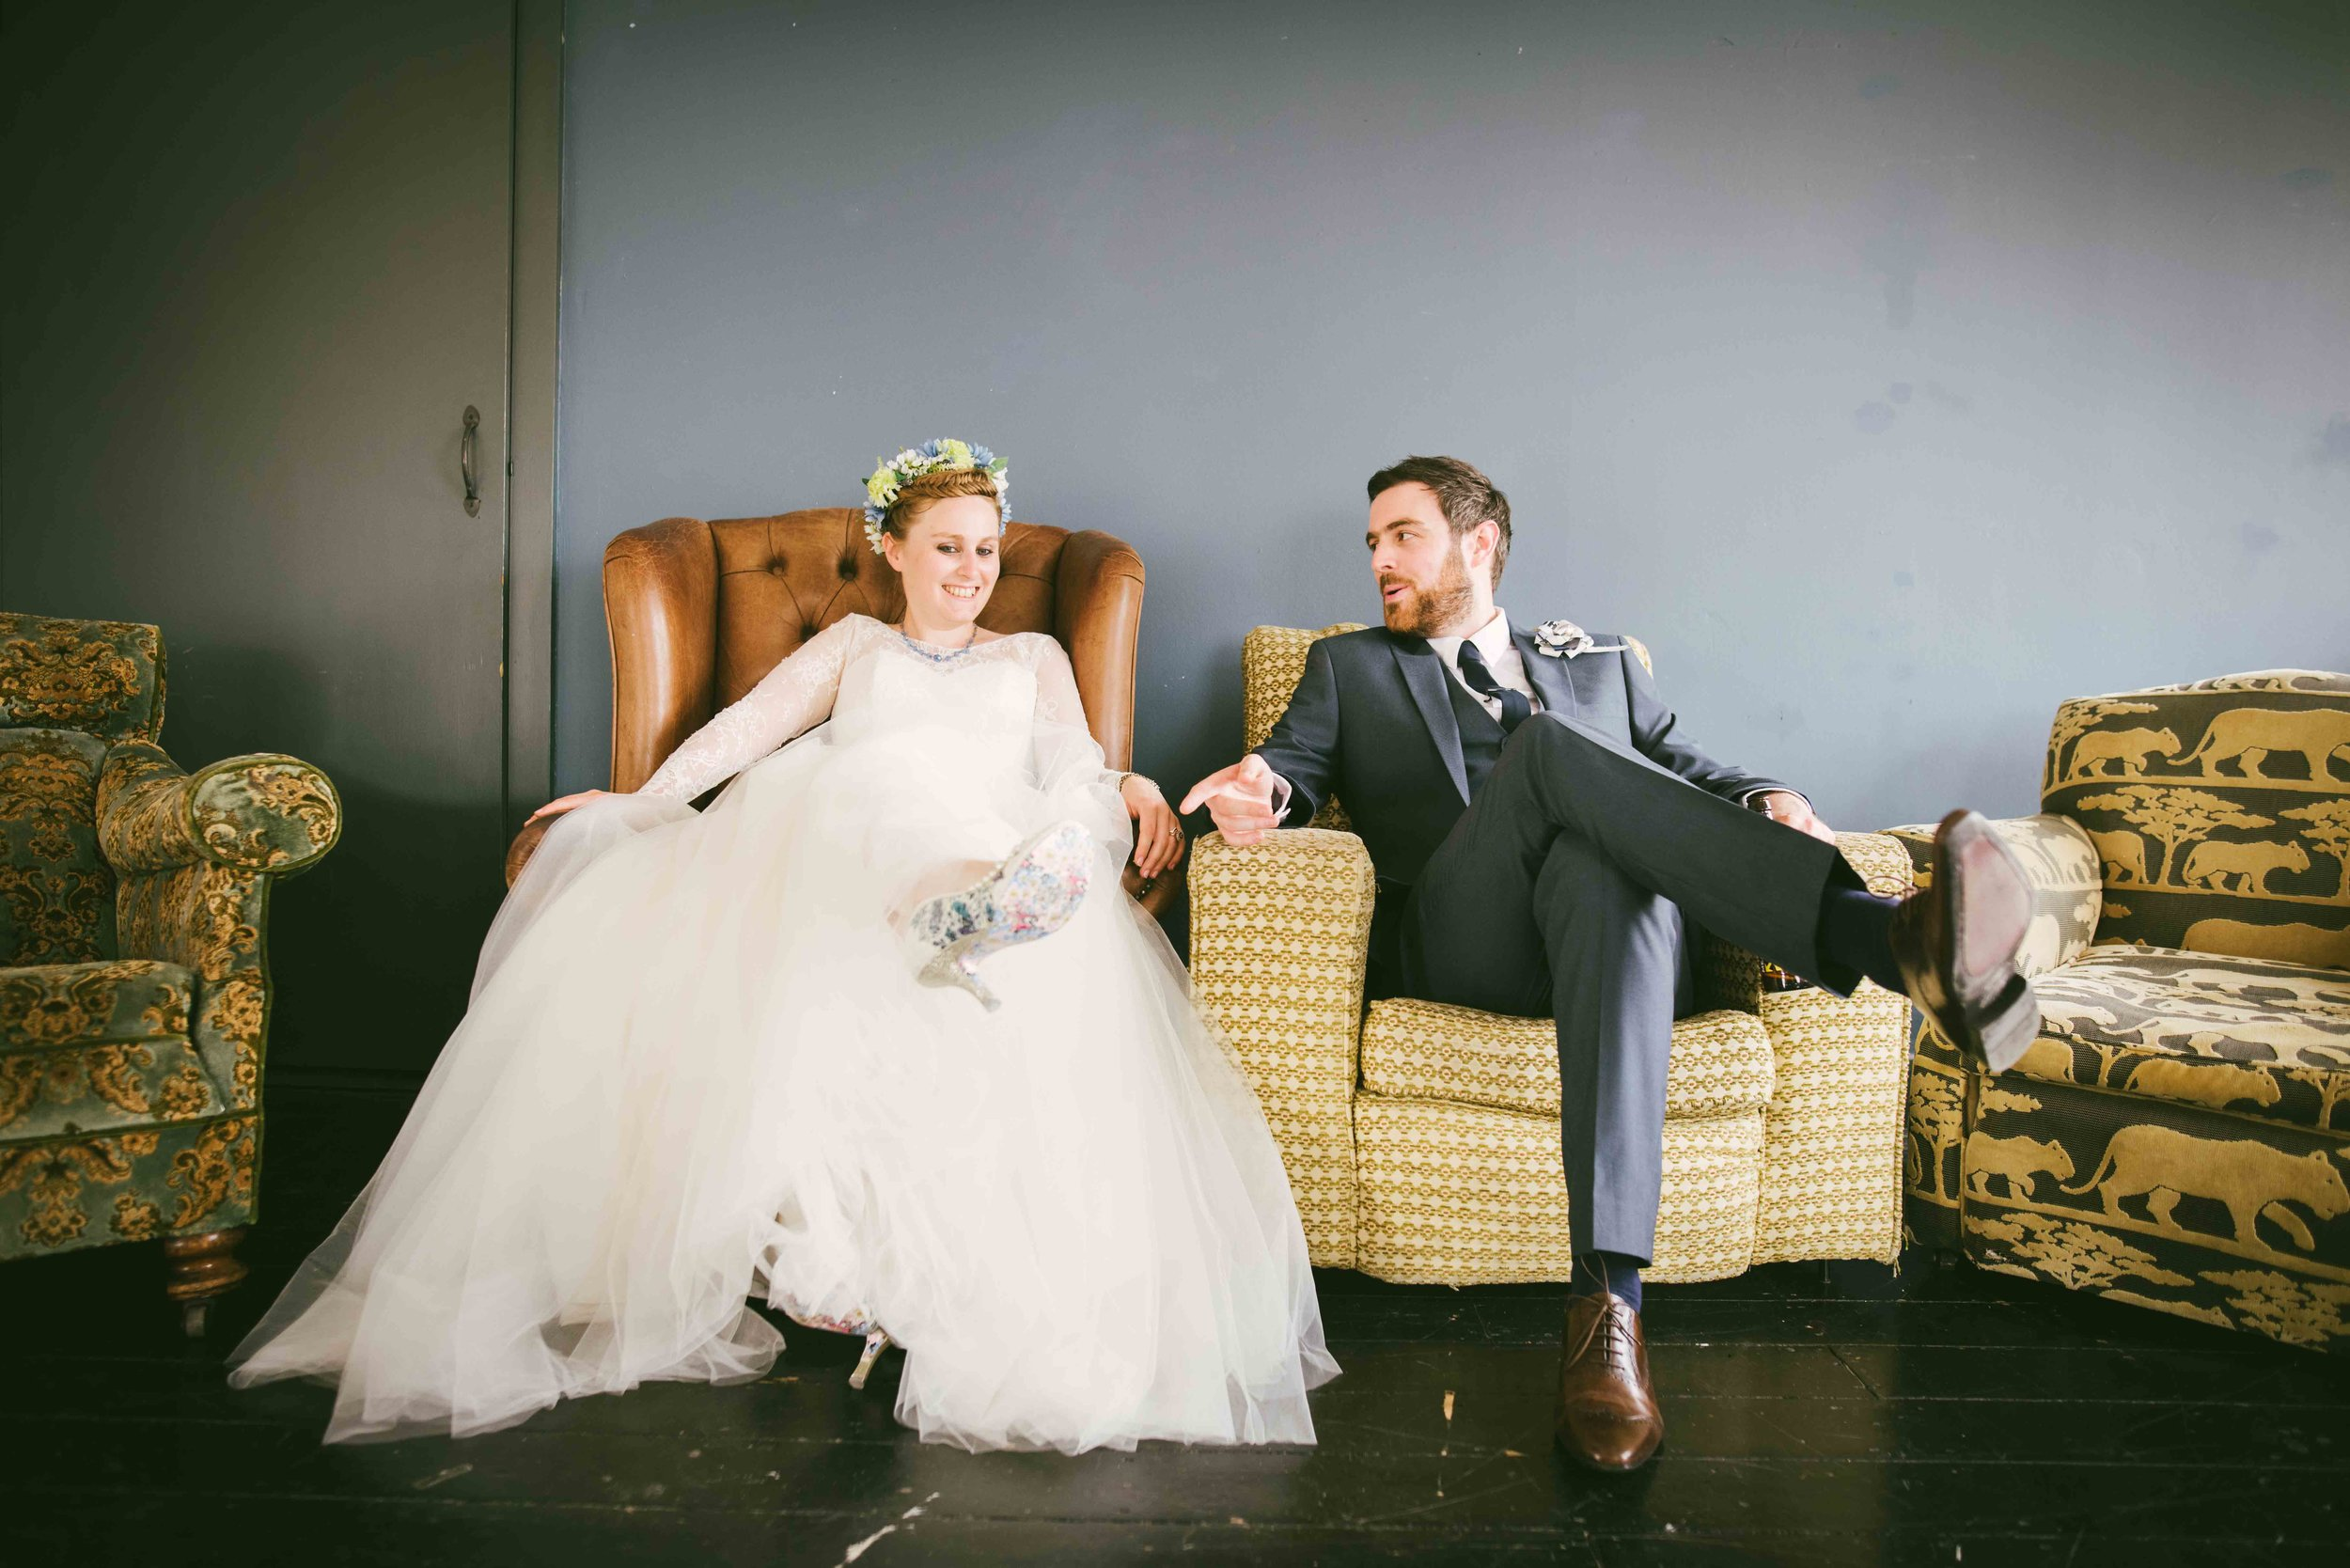 Friendly Place 8-bit Wedding - August 2017